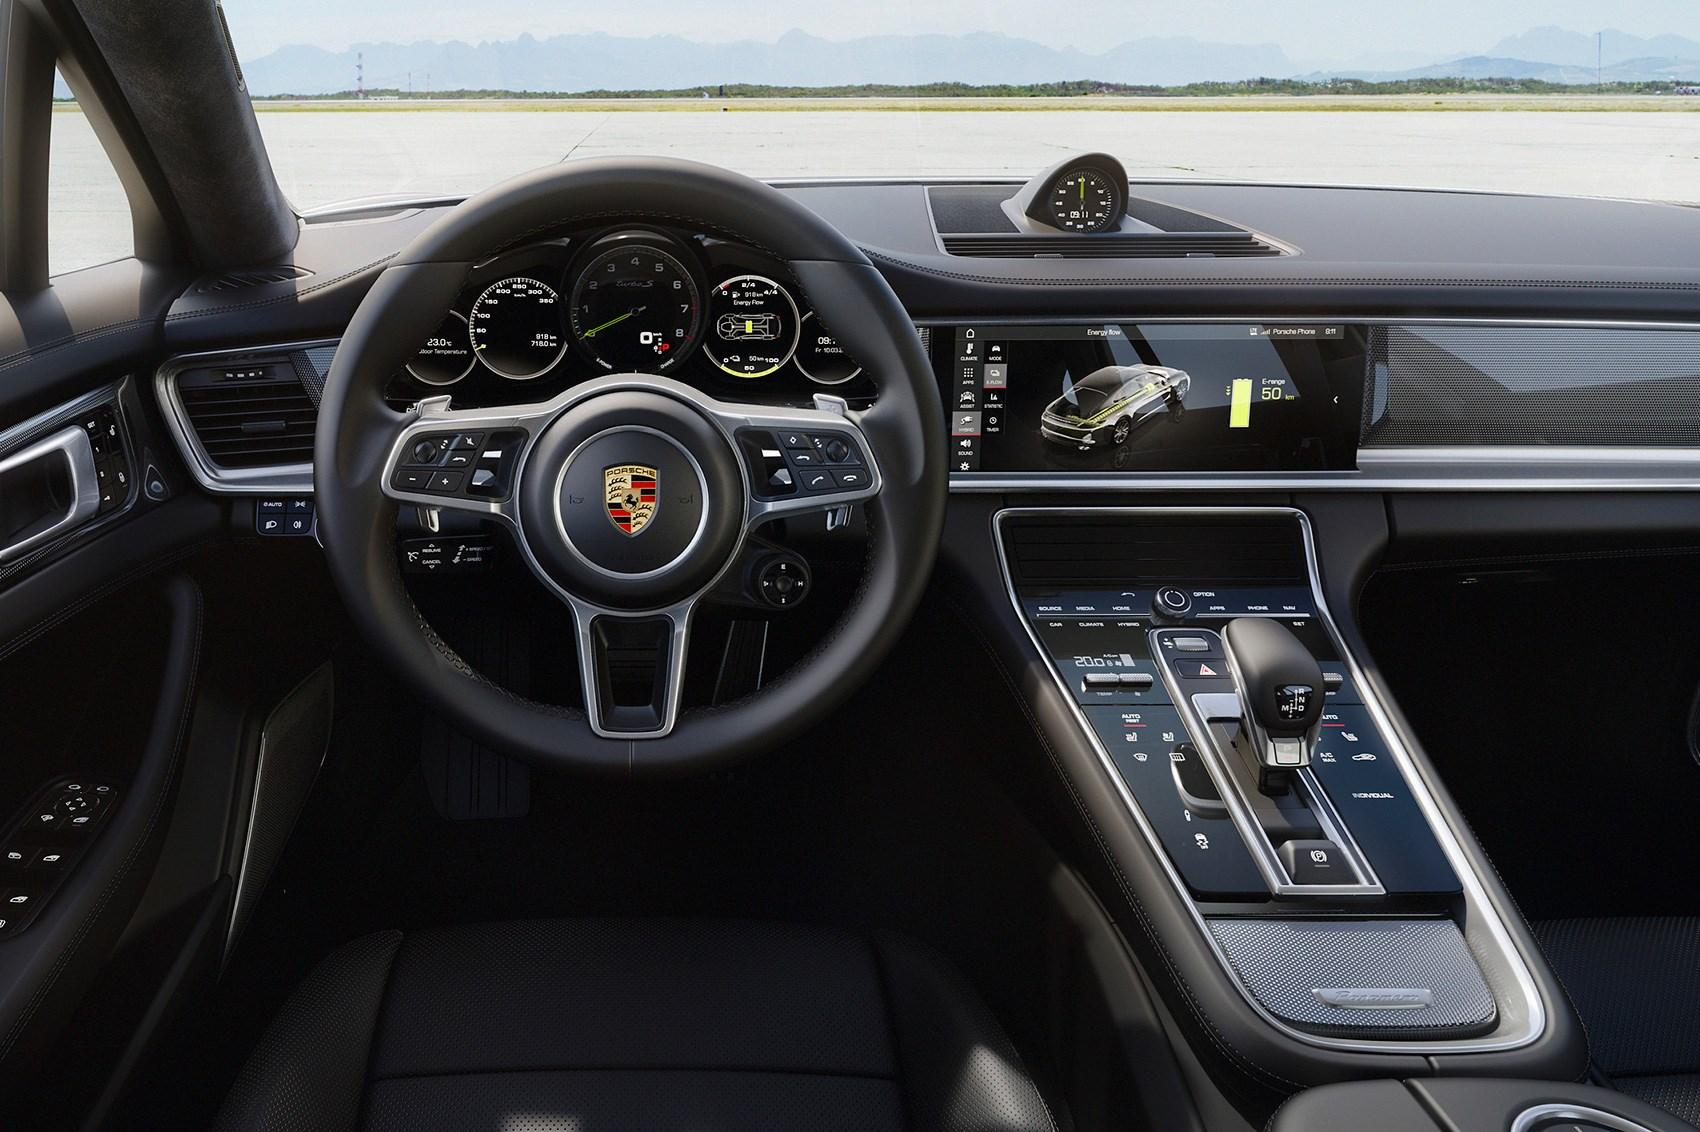 Porsche Panamera Turbo S E Hybrid The Fastest Panam Is A Plug In